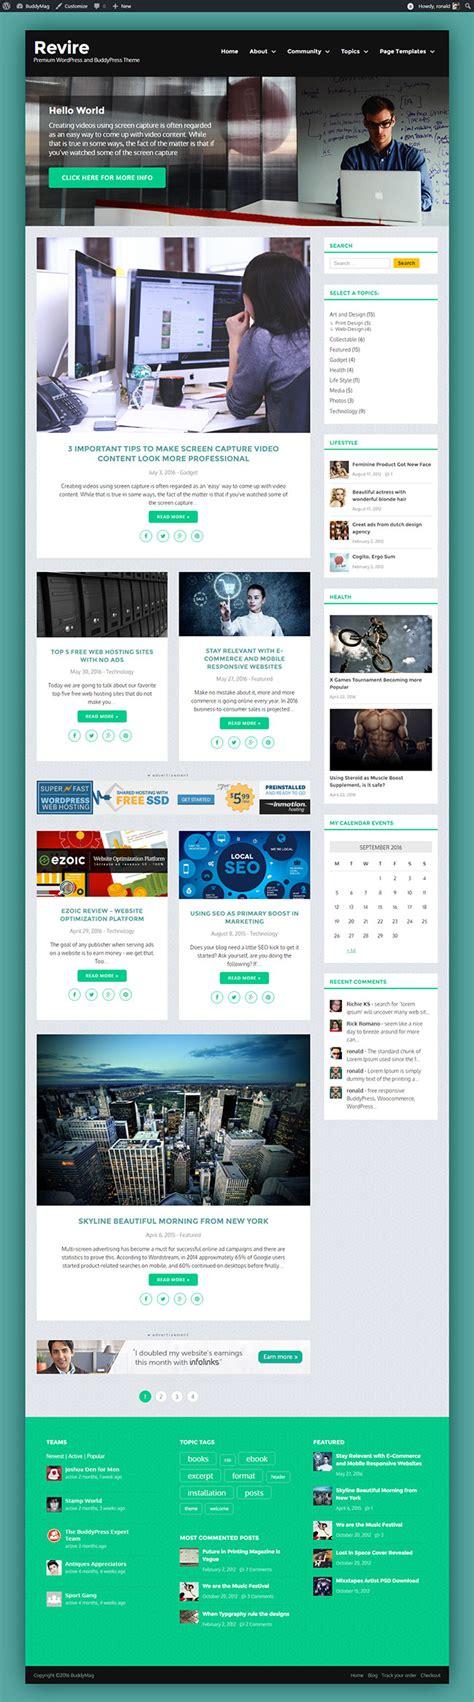 revire tech savvy responsive theme wordpress